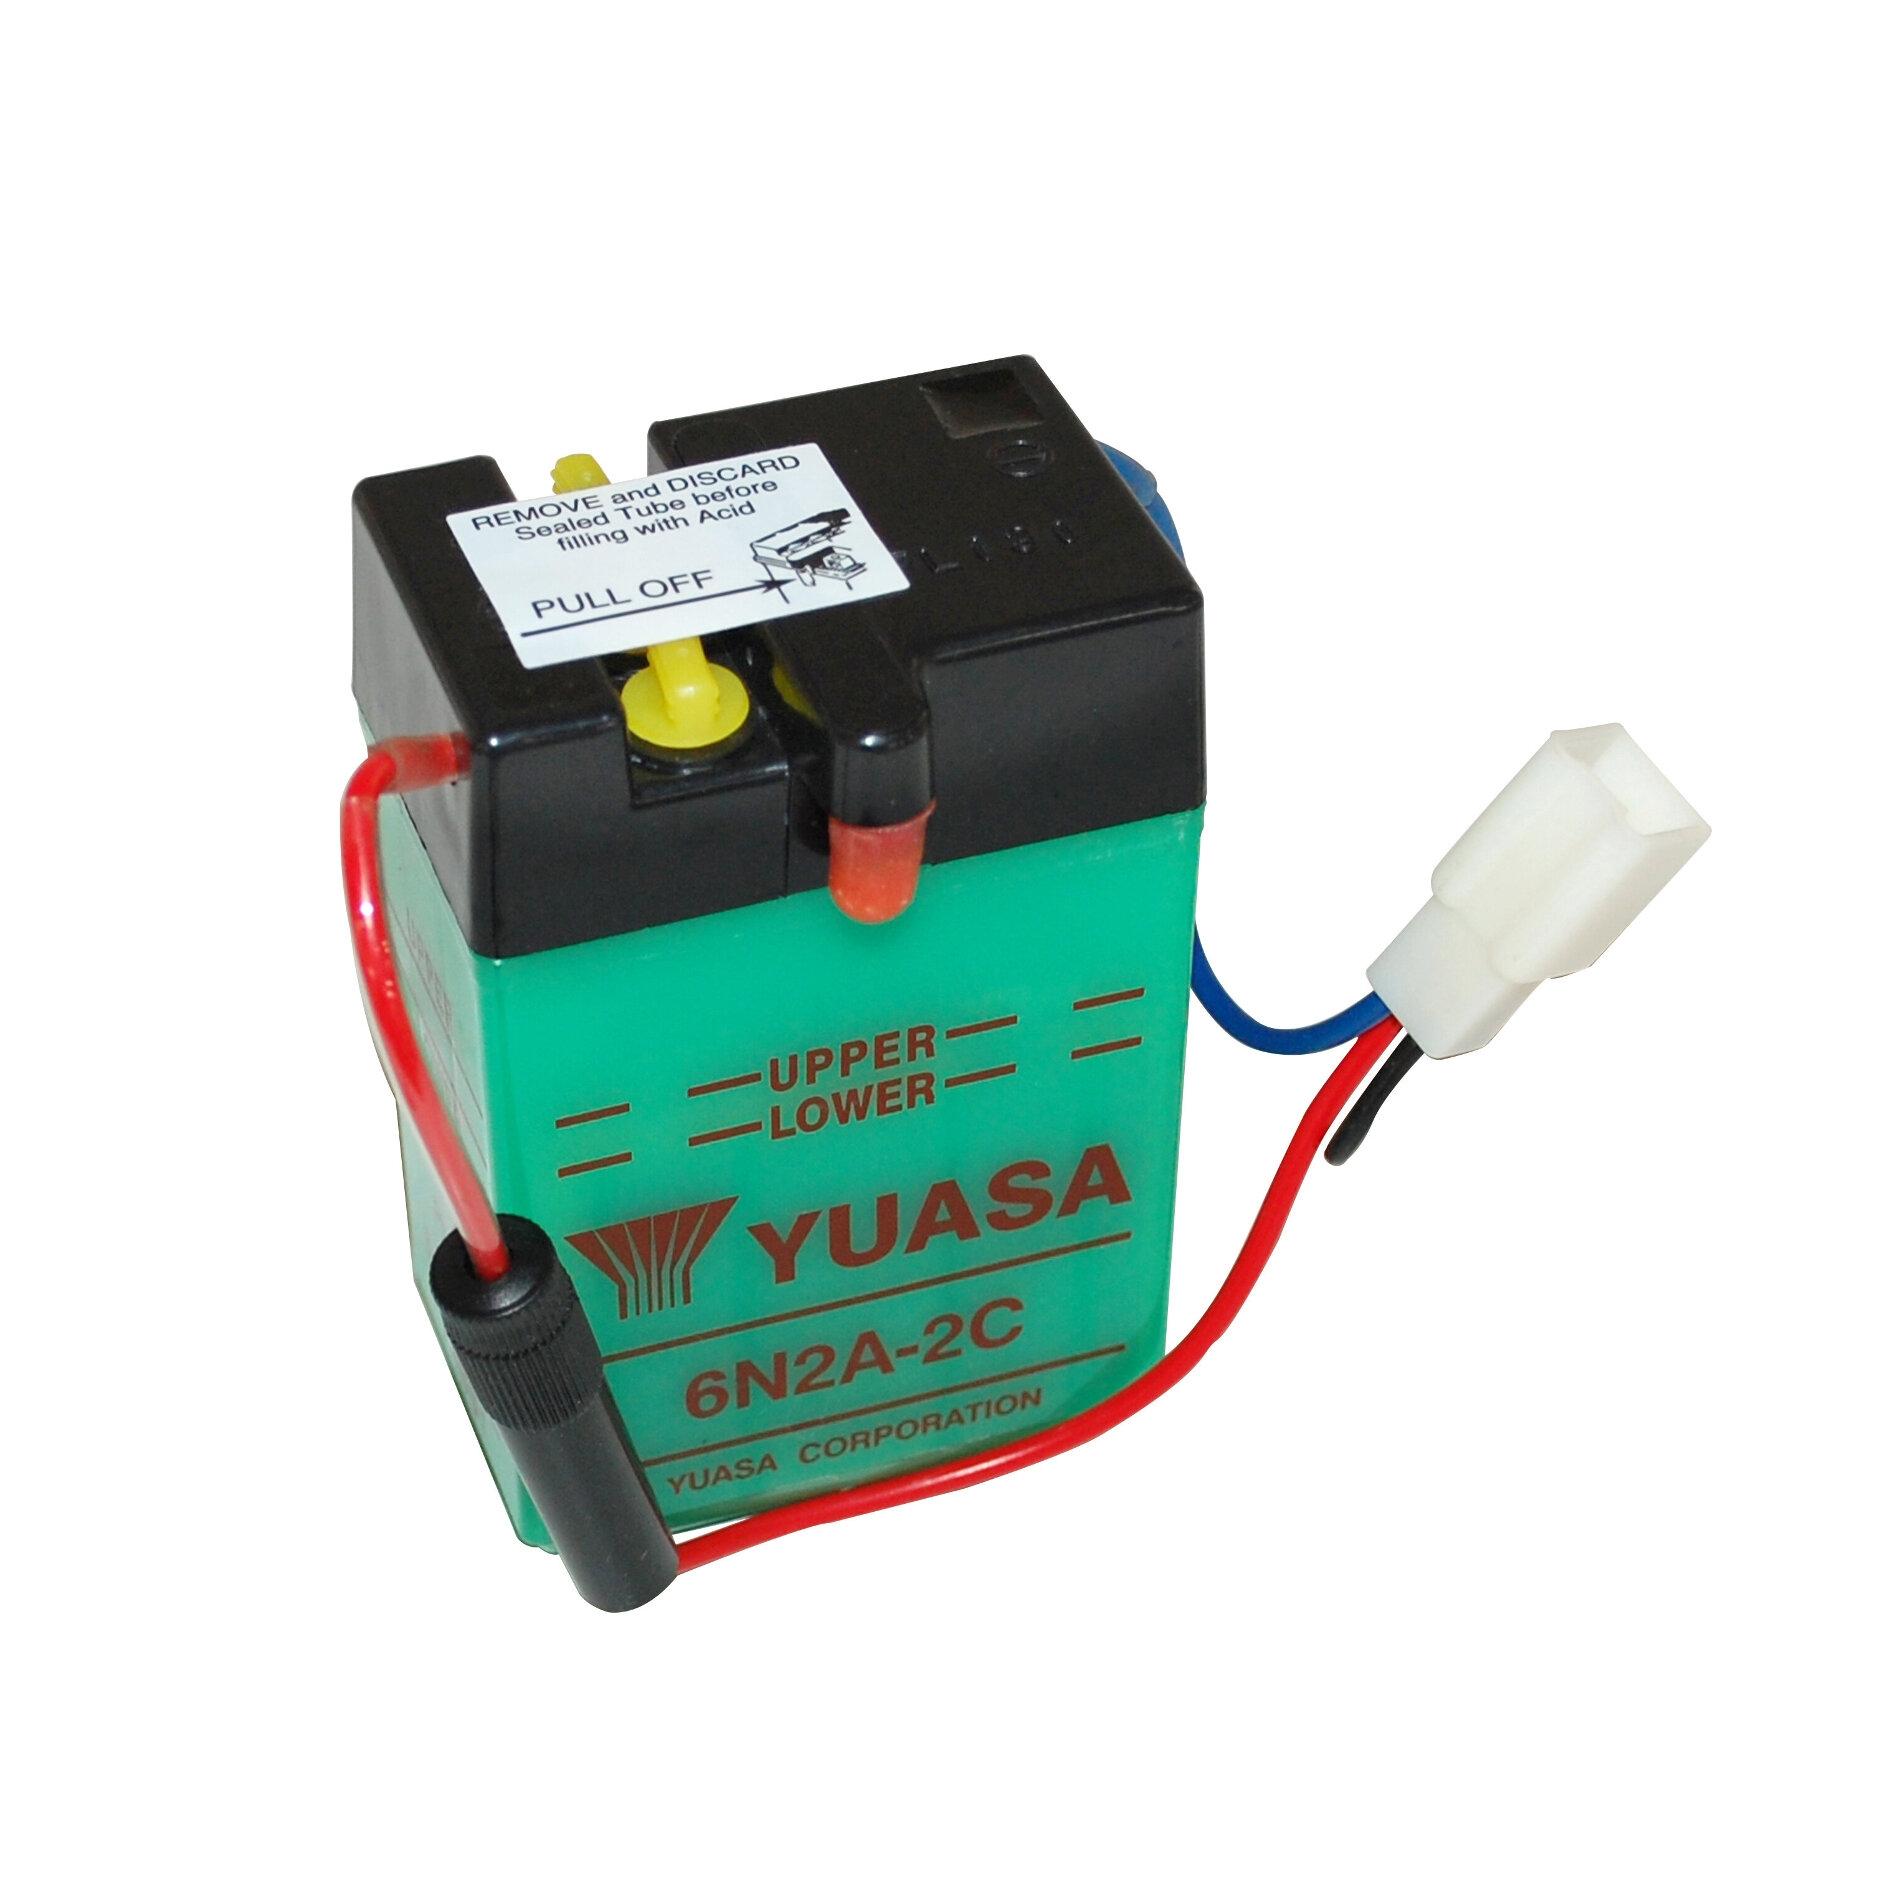 Batterie Yuasa 6N2A-2C 6V 2Ah